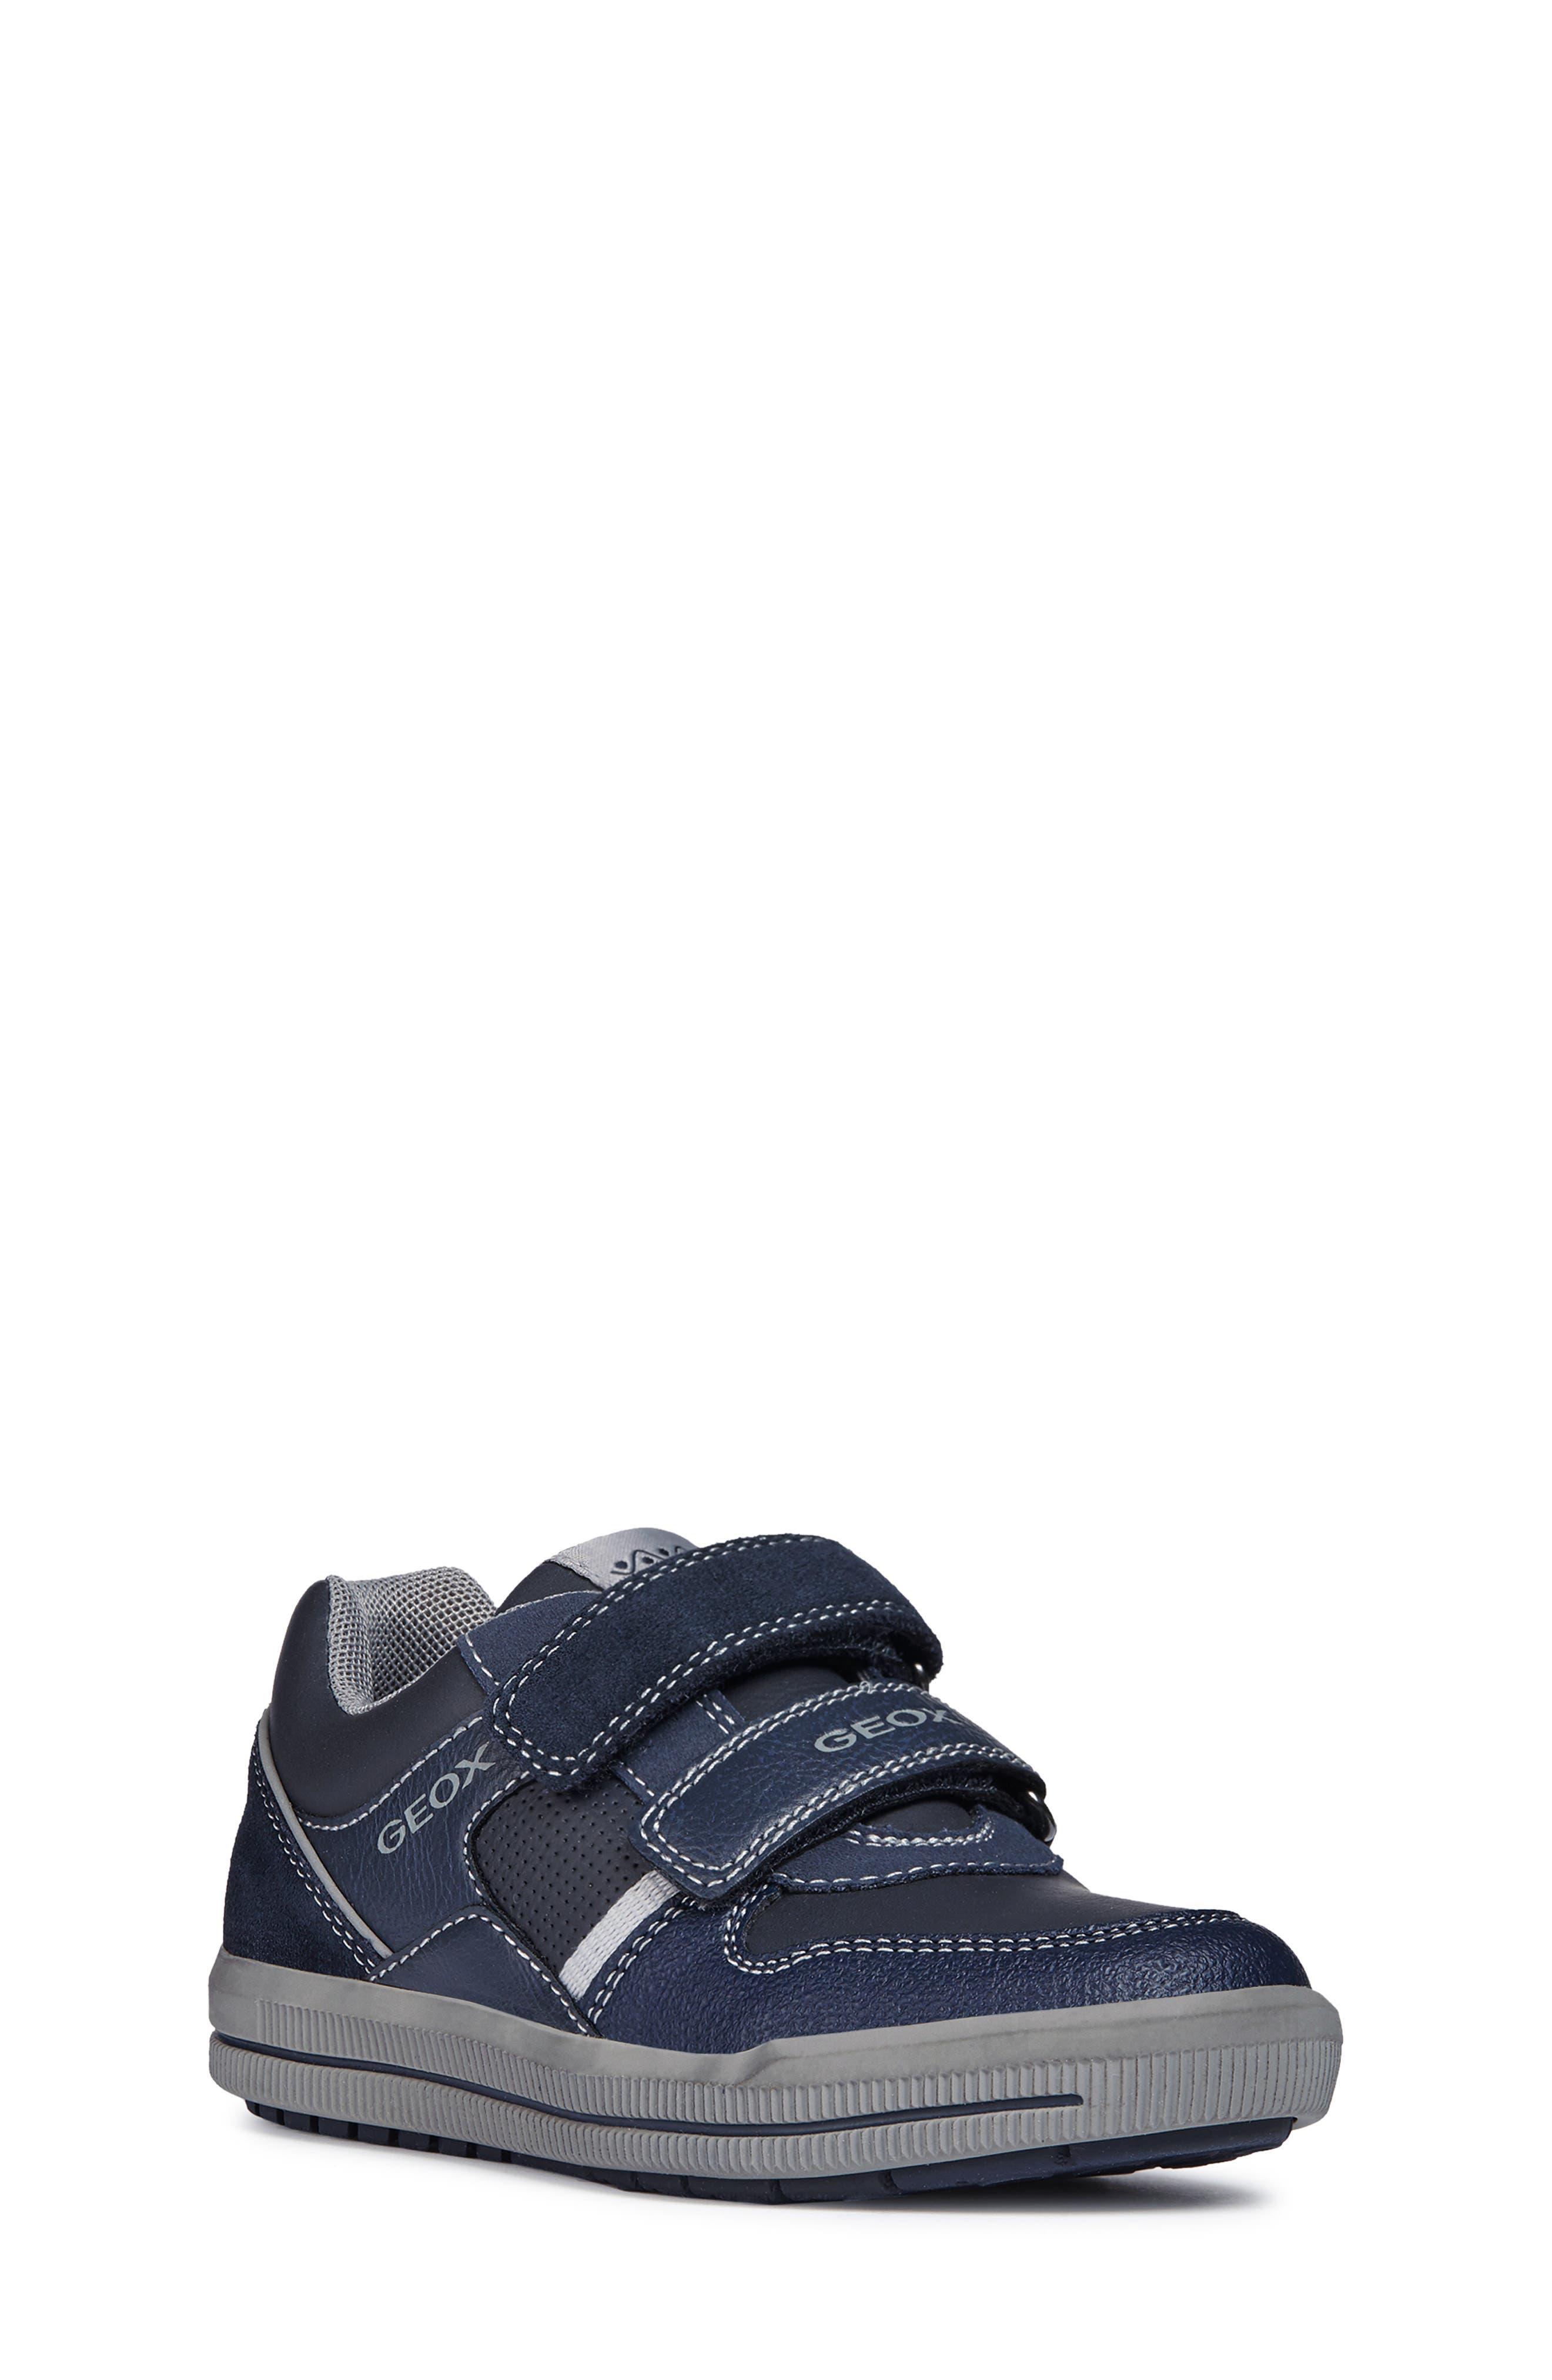 Jr Arzach Sneaker,                             Main thumbnail 1, color,                             Navy Blue/ Grey